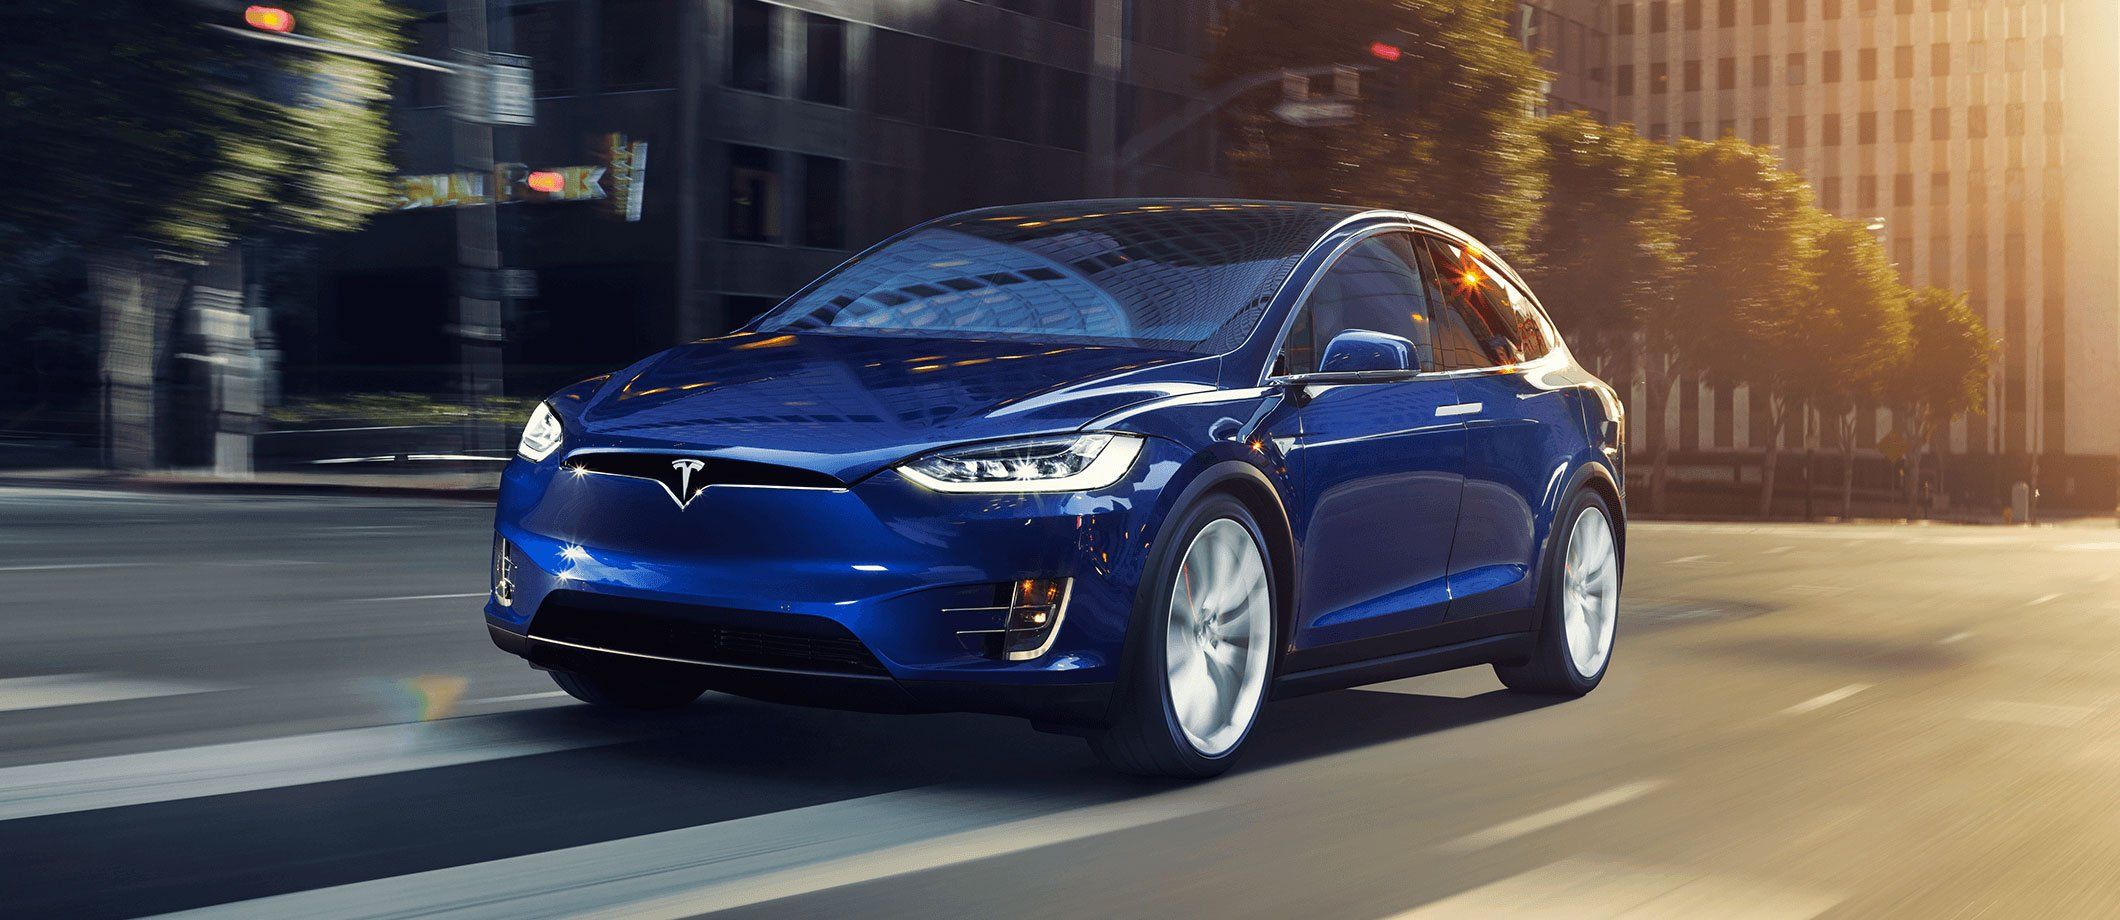 Tesla-Model-X-coches-electricos-del-salon-del-automovil-de-Madrid-13